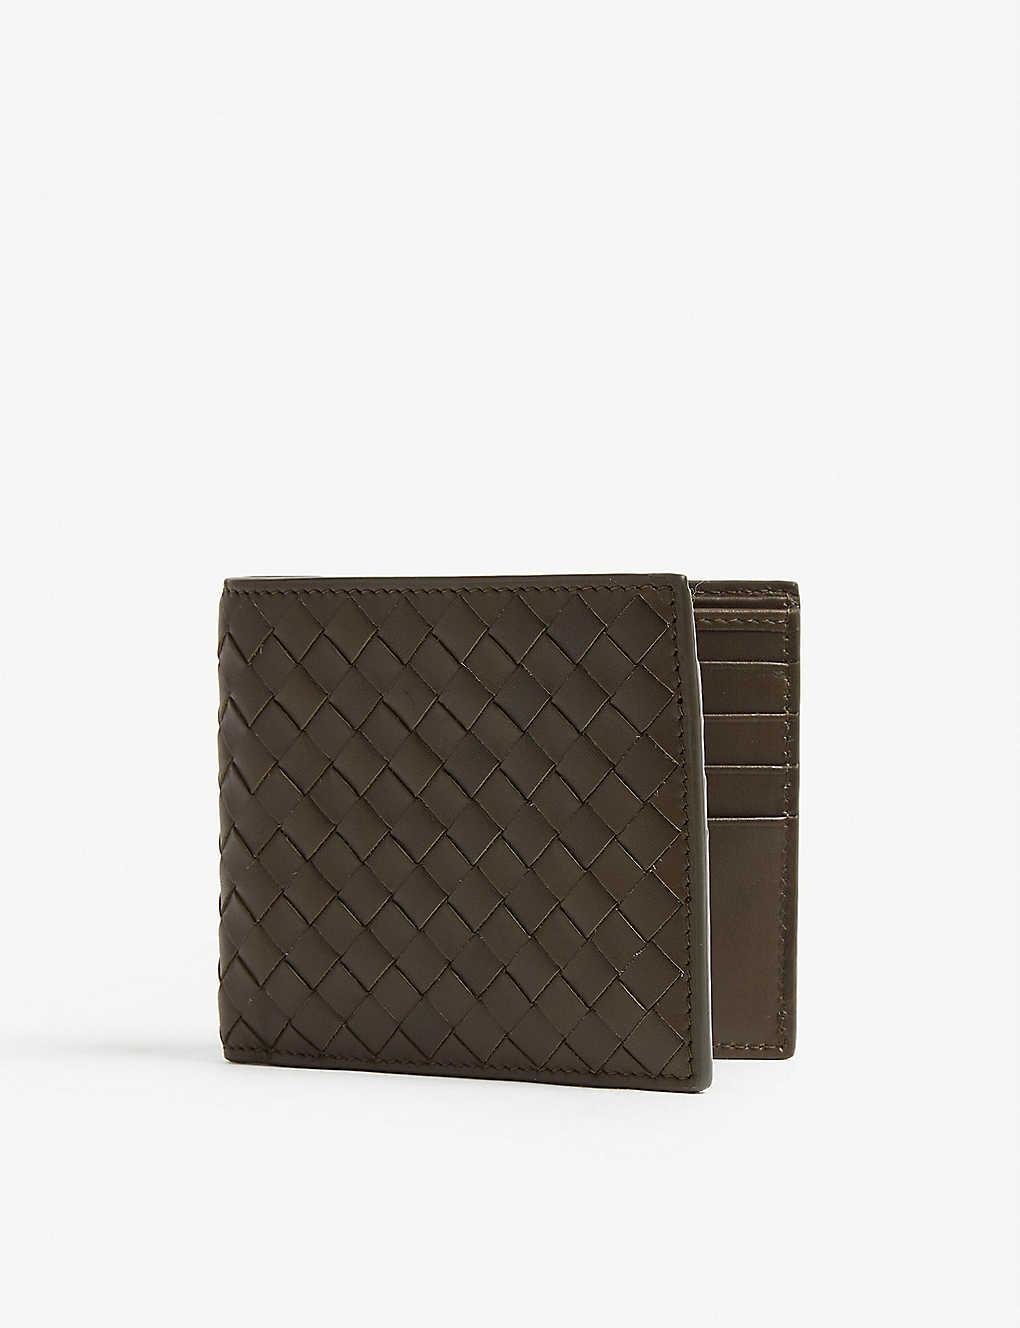 ab405ad82509a BOTTEGA VENETA - Intrecciato woven leather billfold wallet ...